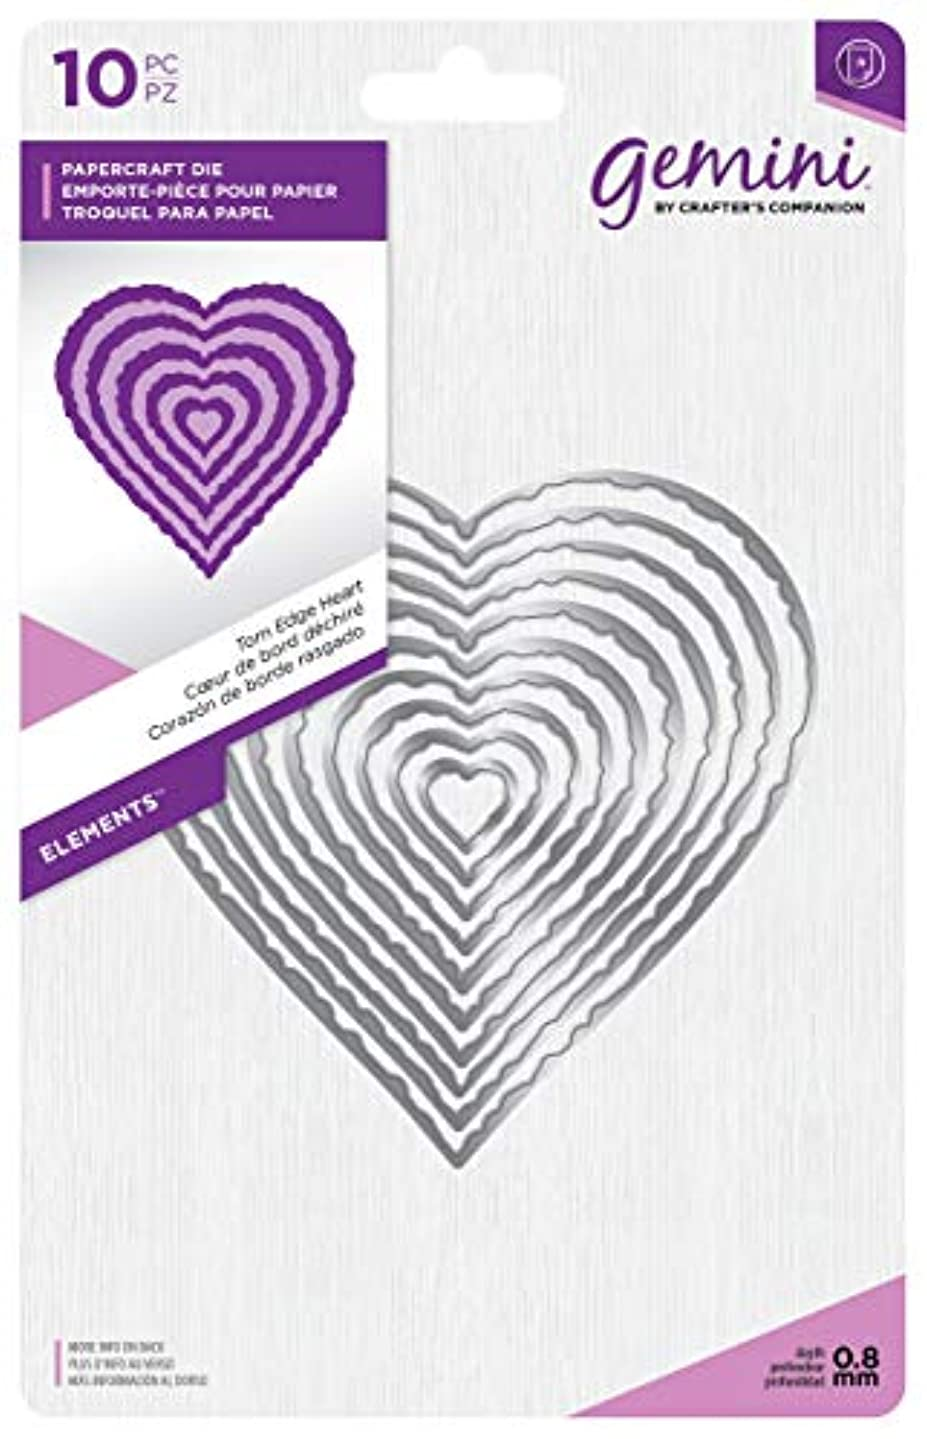 Gemini Elements-Torn Edge Heart, Silver, Various